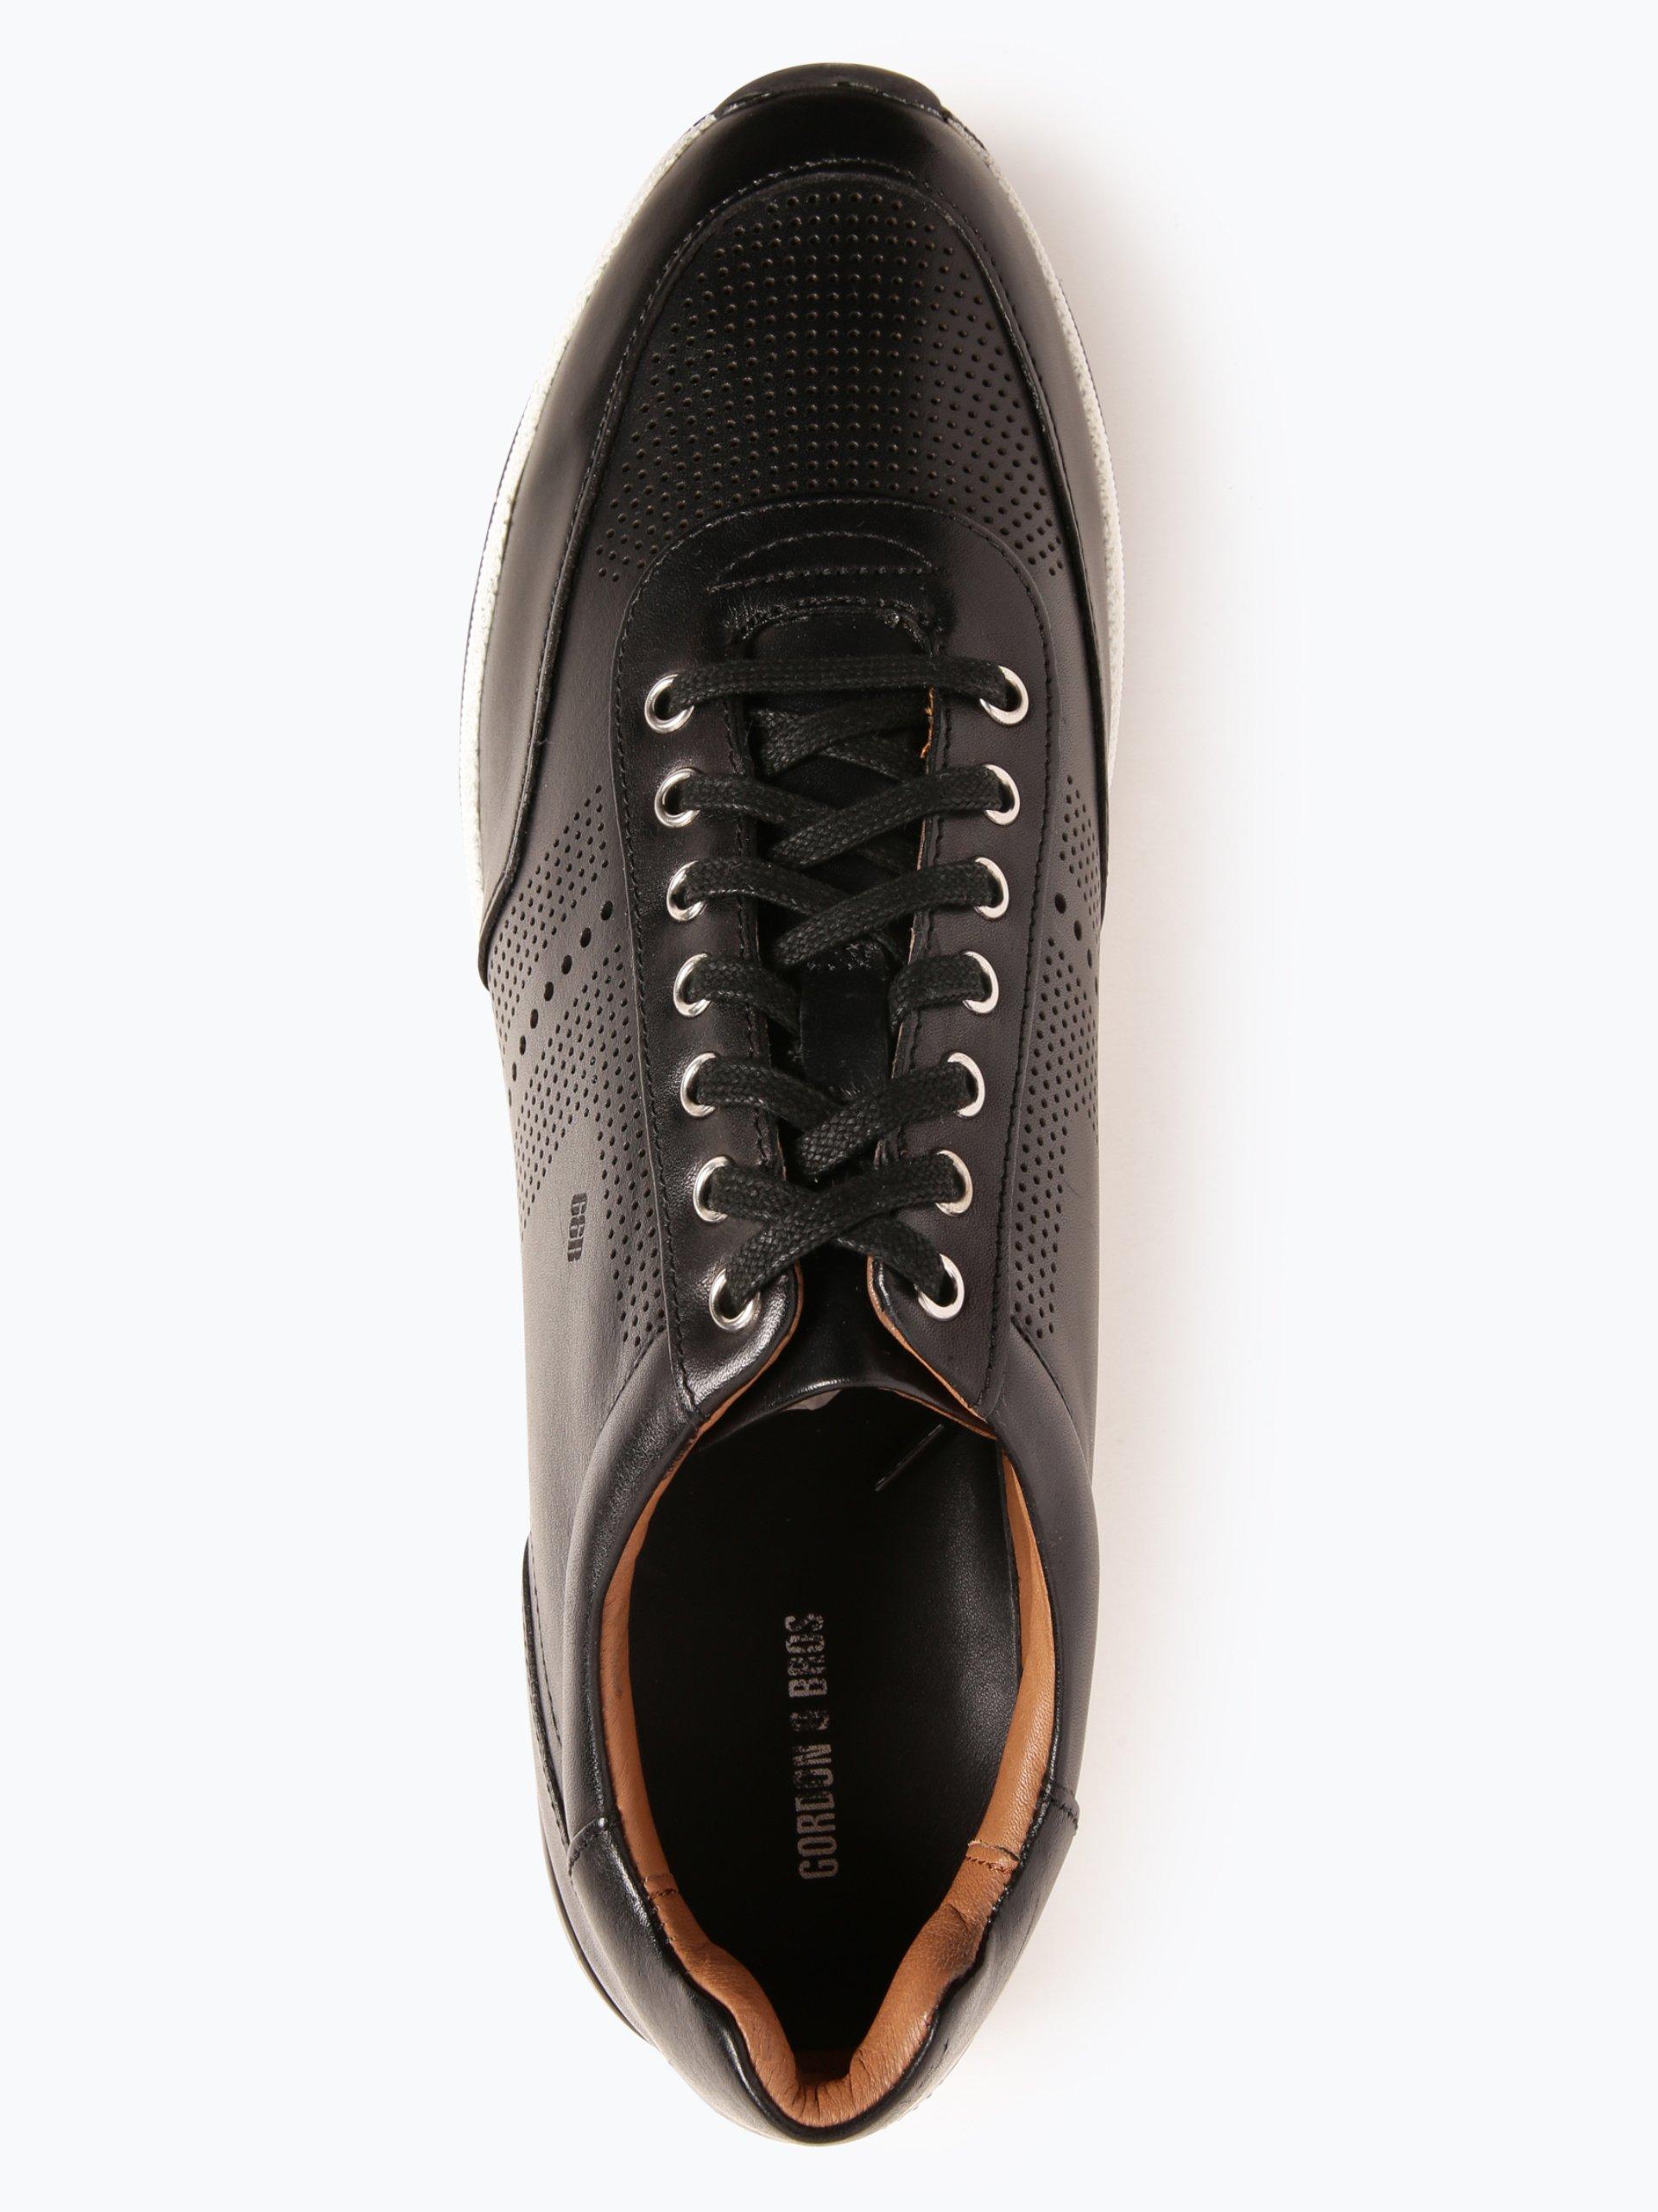 gordon bros herren sneaker aus leder new conte schwarz uni online kaufen vangraaf com. Black Bedroom Furniture Sets. Home Design Ideas